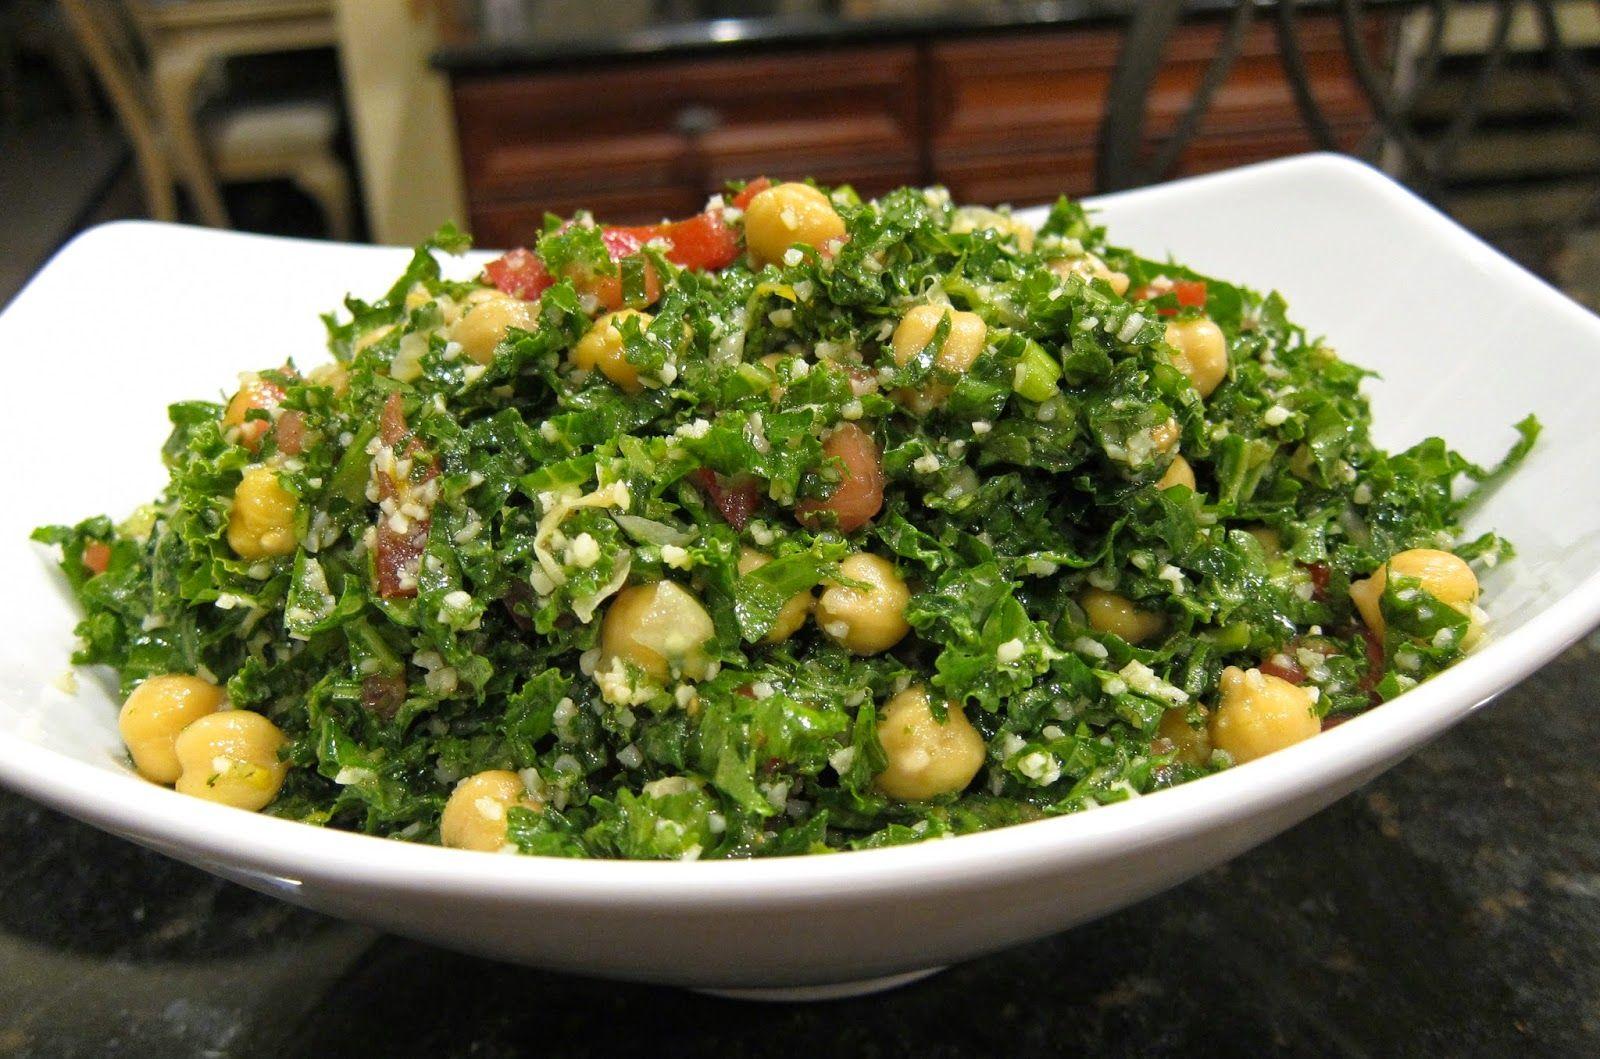 Kale and Chickpea Salad Chickpea salad recipes, Salad